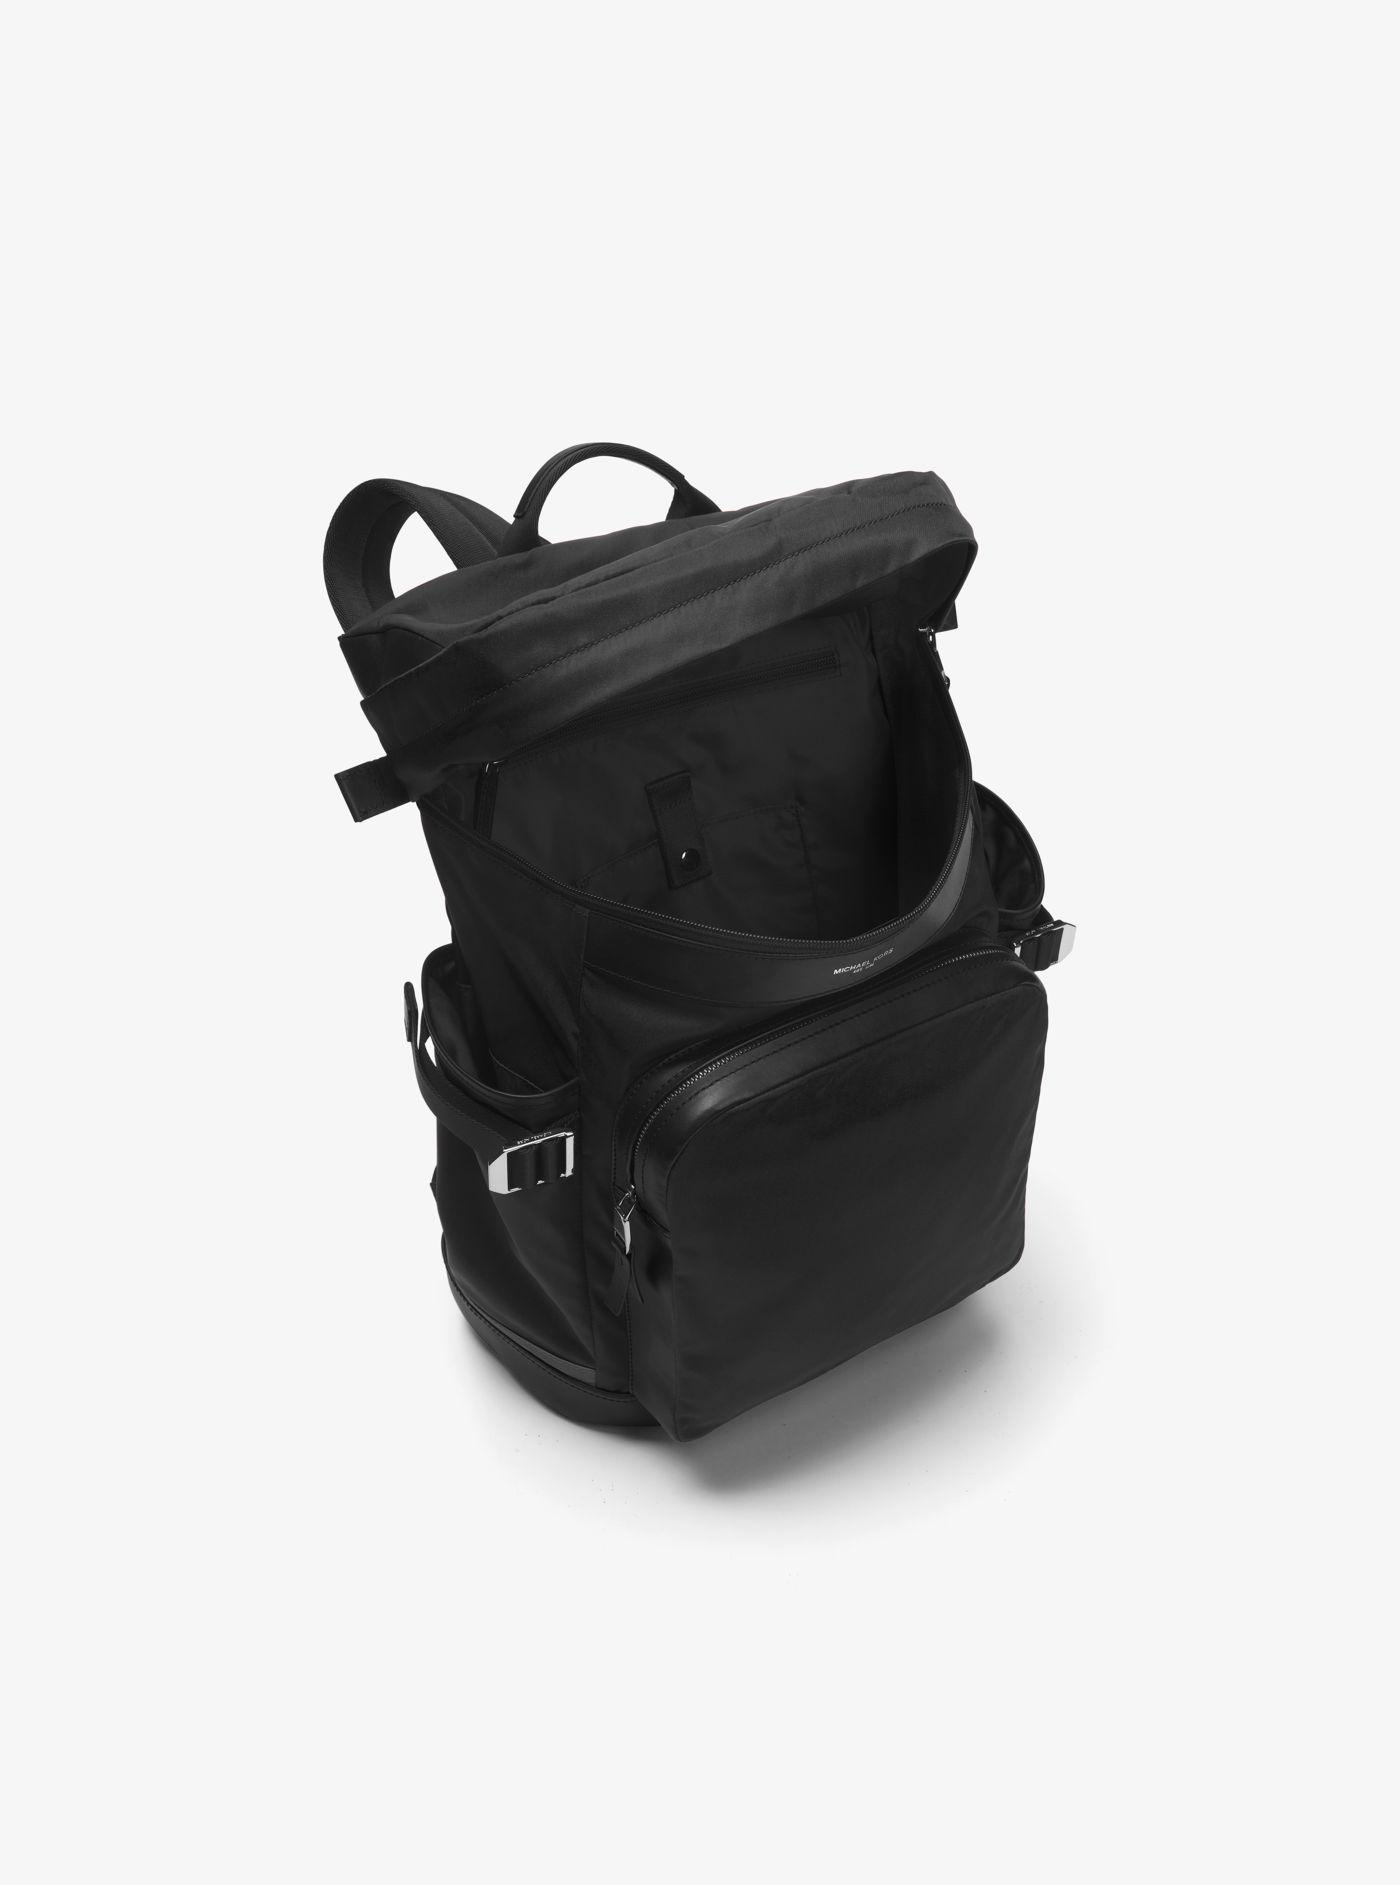 c2a7e726b0f1 Lyst - Michael Kors Kent Nylon Cycling Backpack in Black for Men